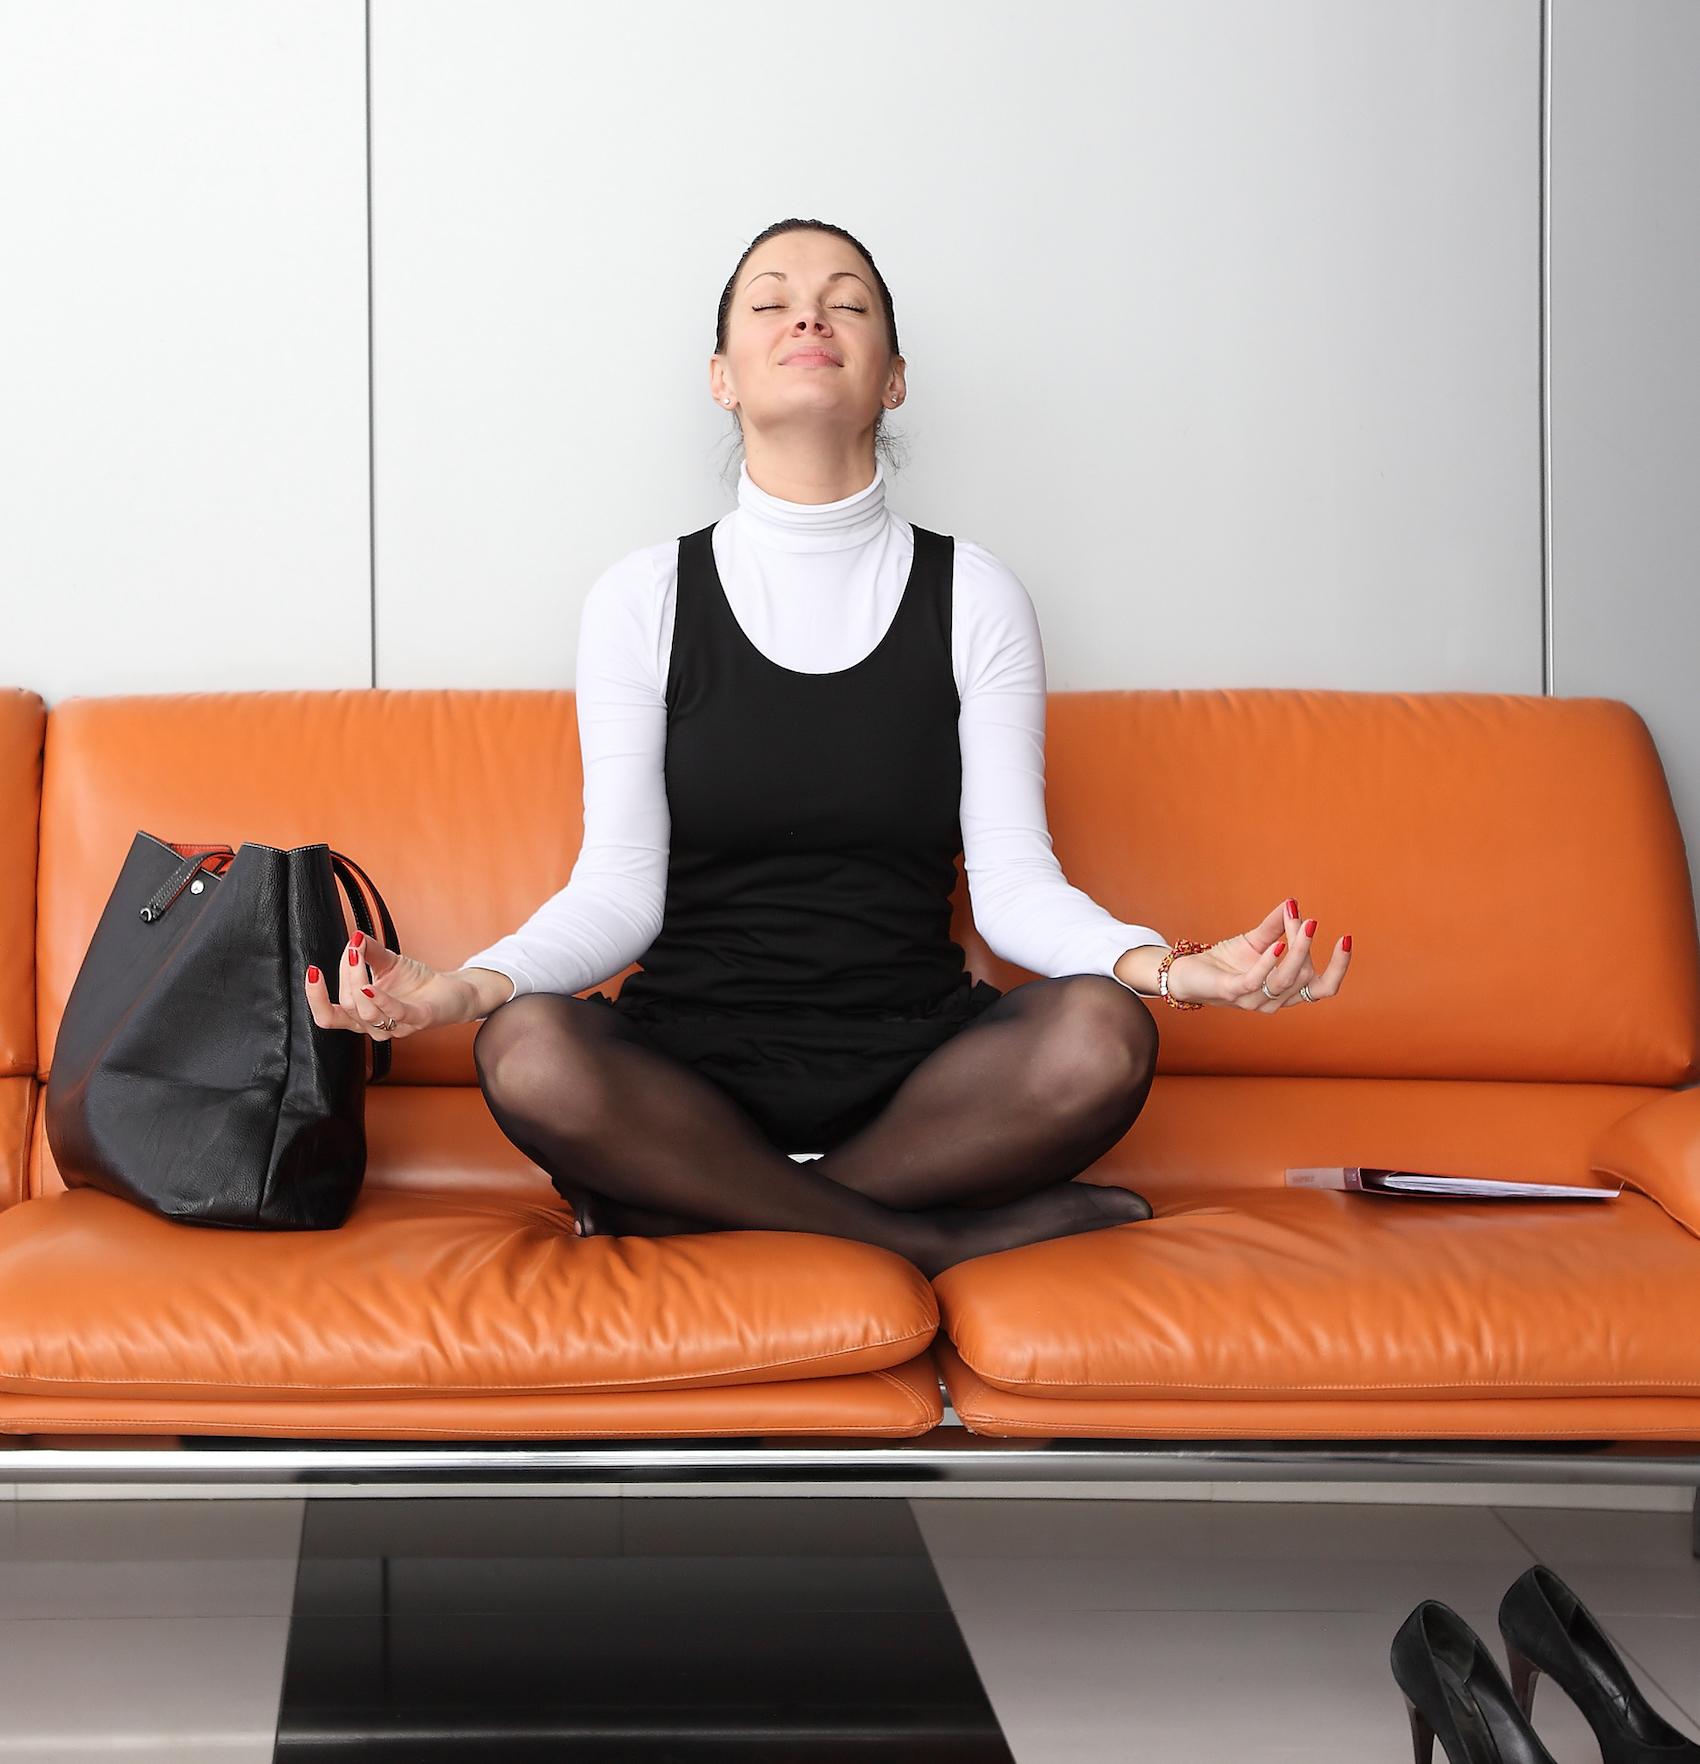 mindfullness meditation happiness